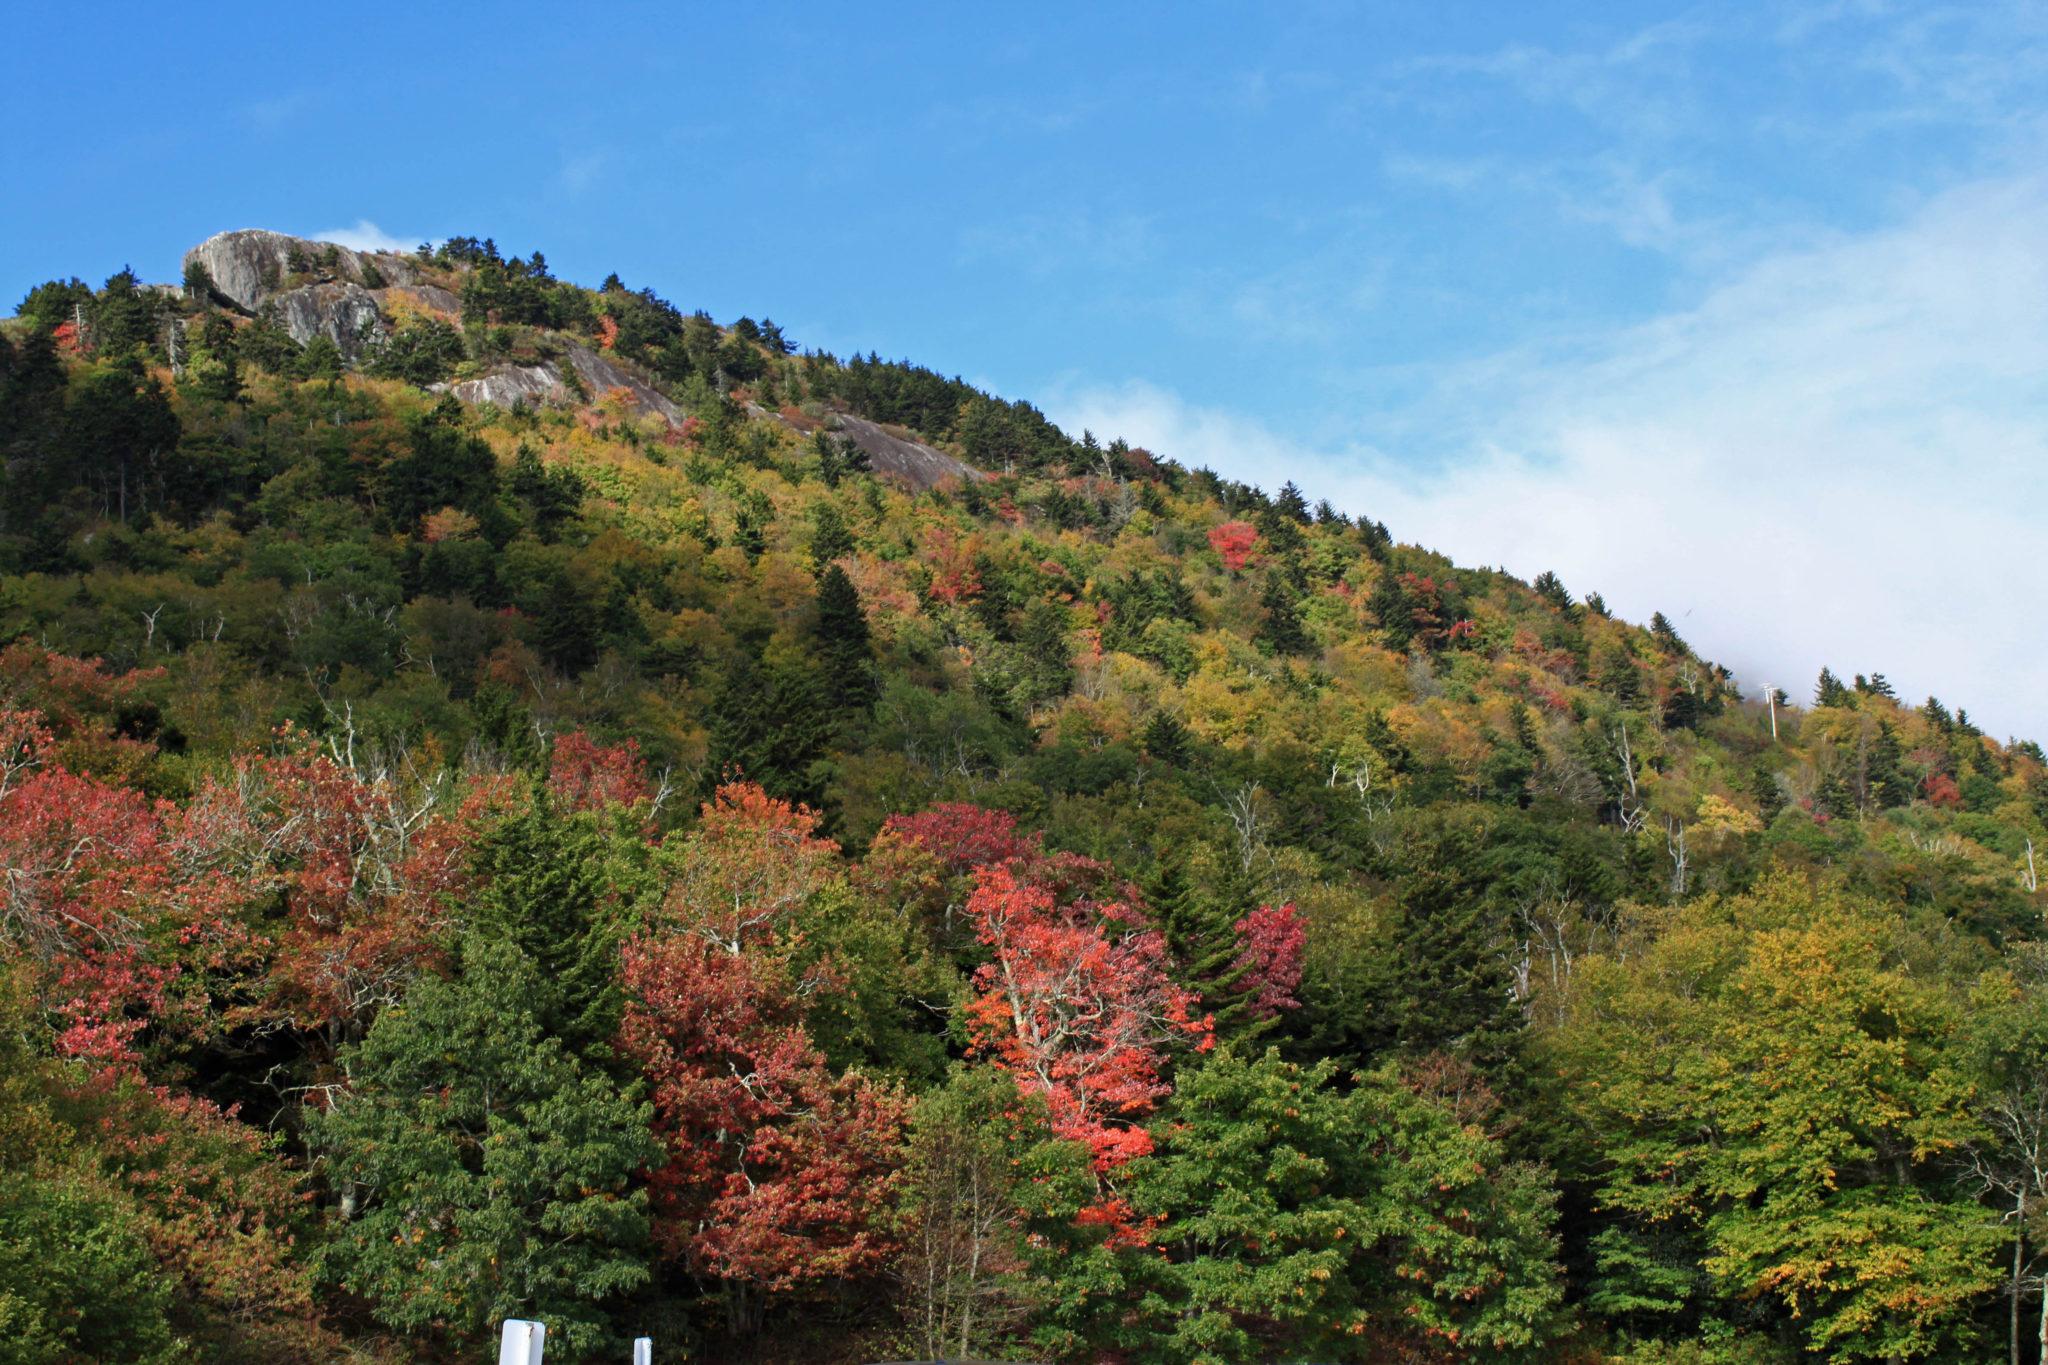 early fall foliage on Grandfather Mountain